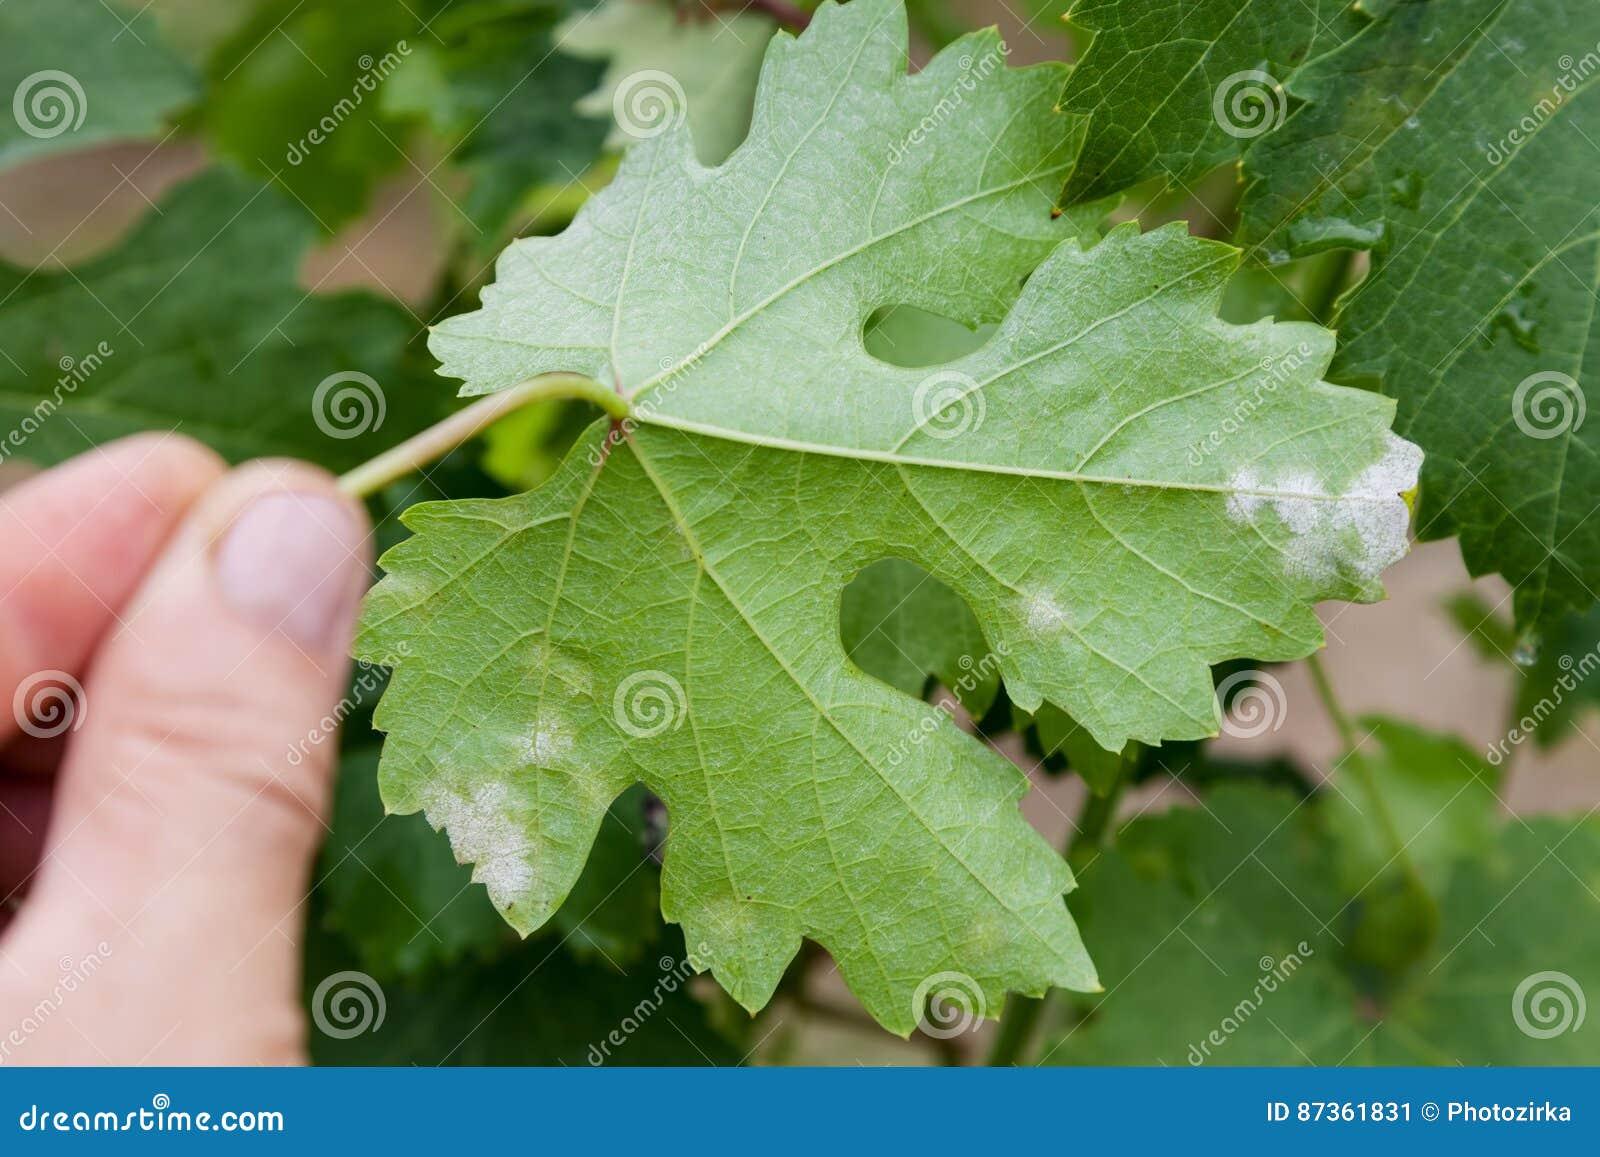 Download Sick grape leaf closeup stock image. Image of hand, injury - 87361831